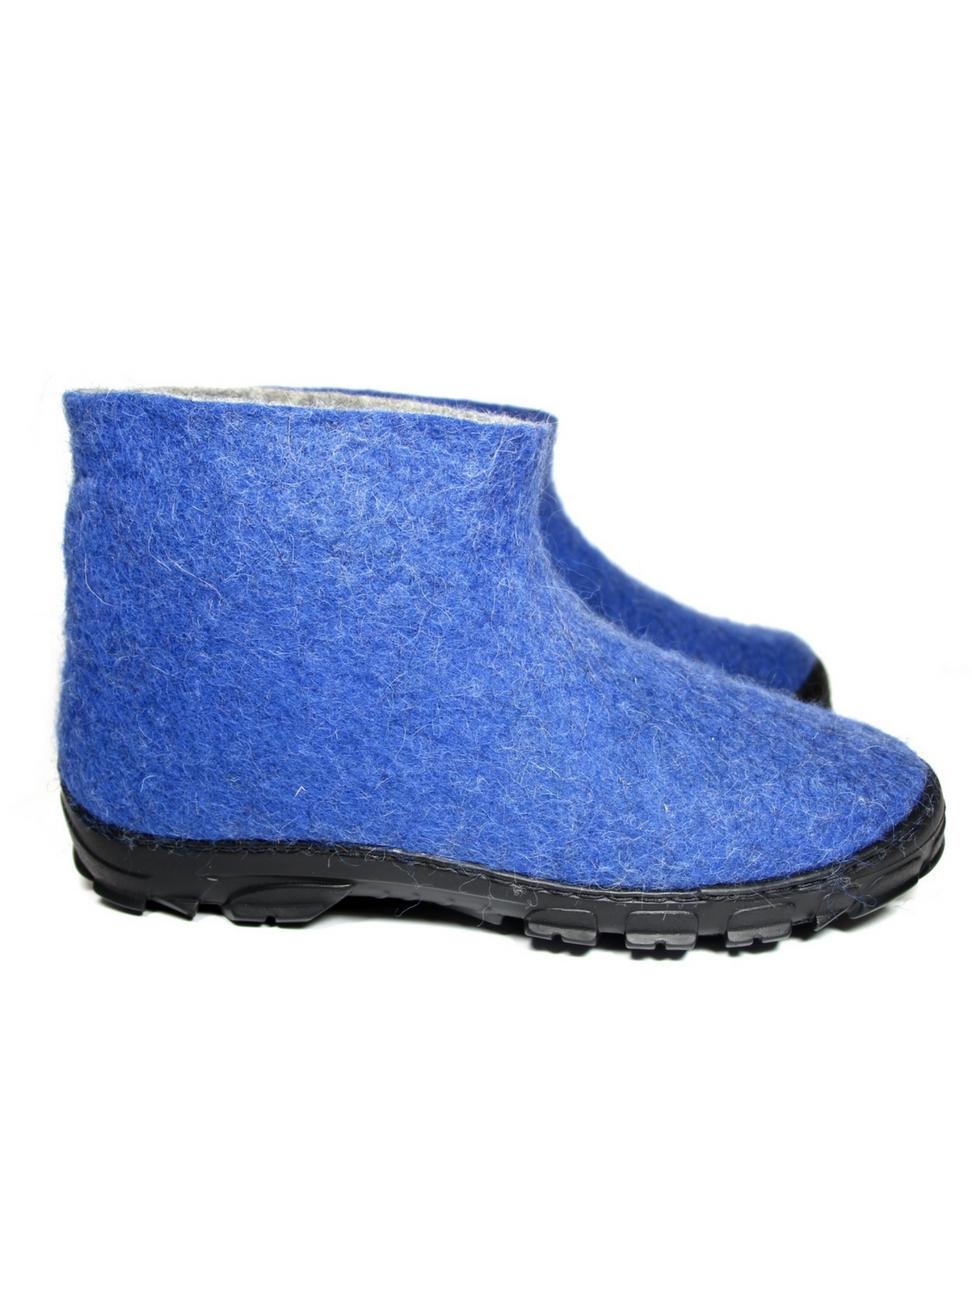 Men's Wool Desert Boots Ocean Blue 2- FELT FORMA.jpg